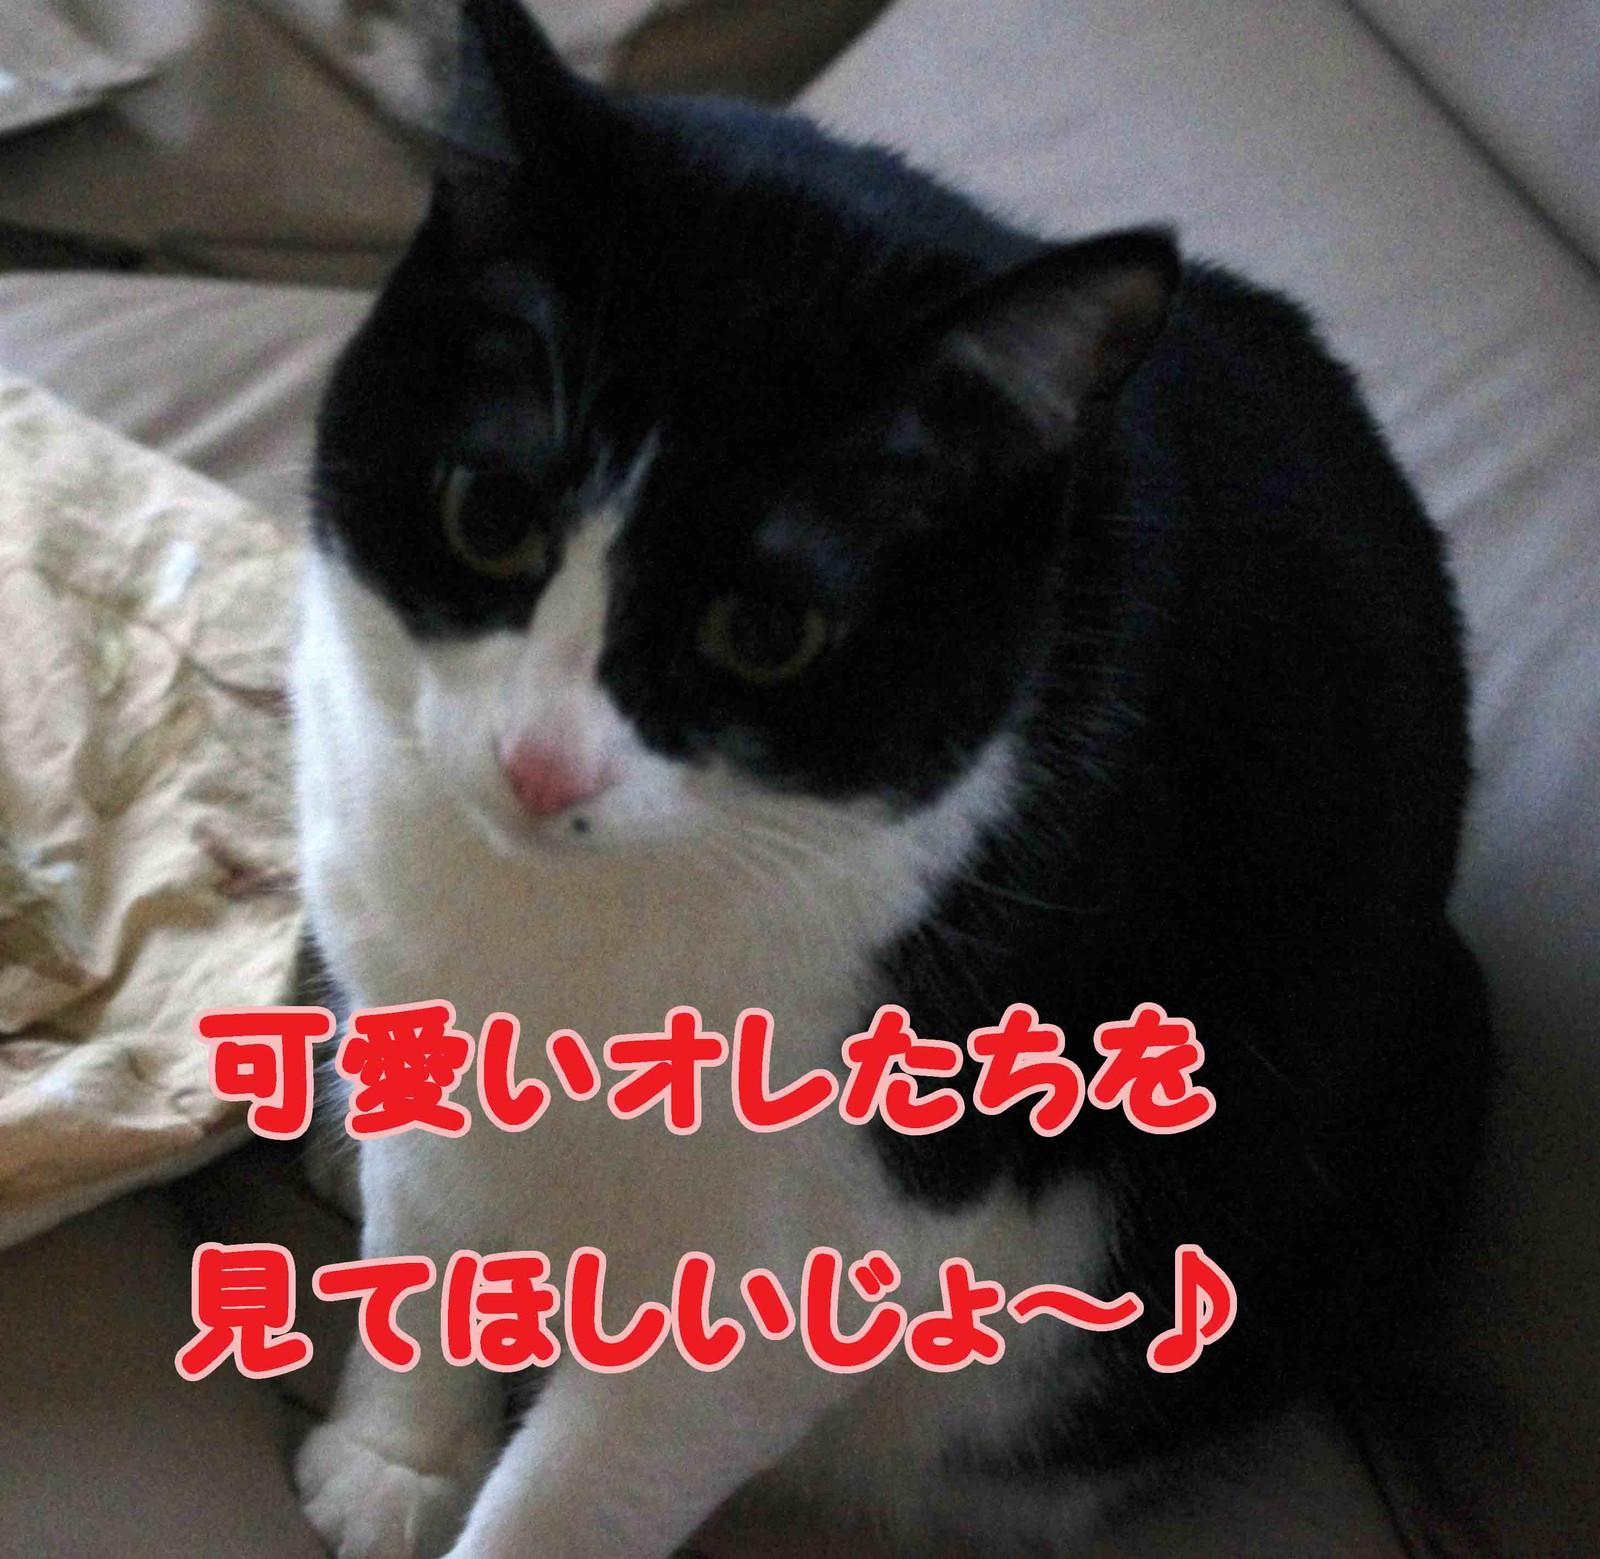 2012_02_23_2344_edited1